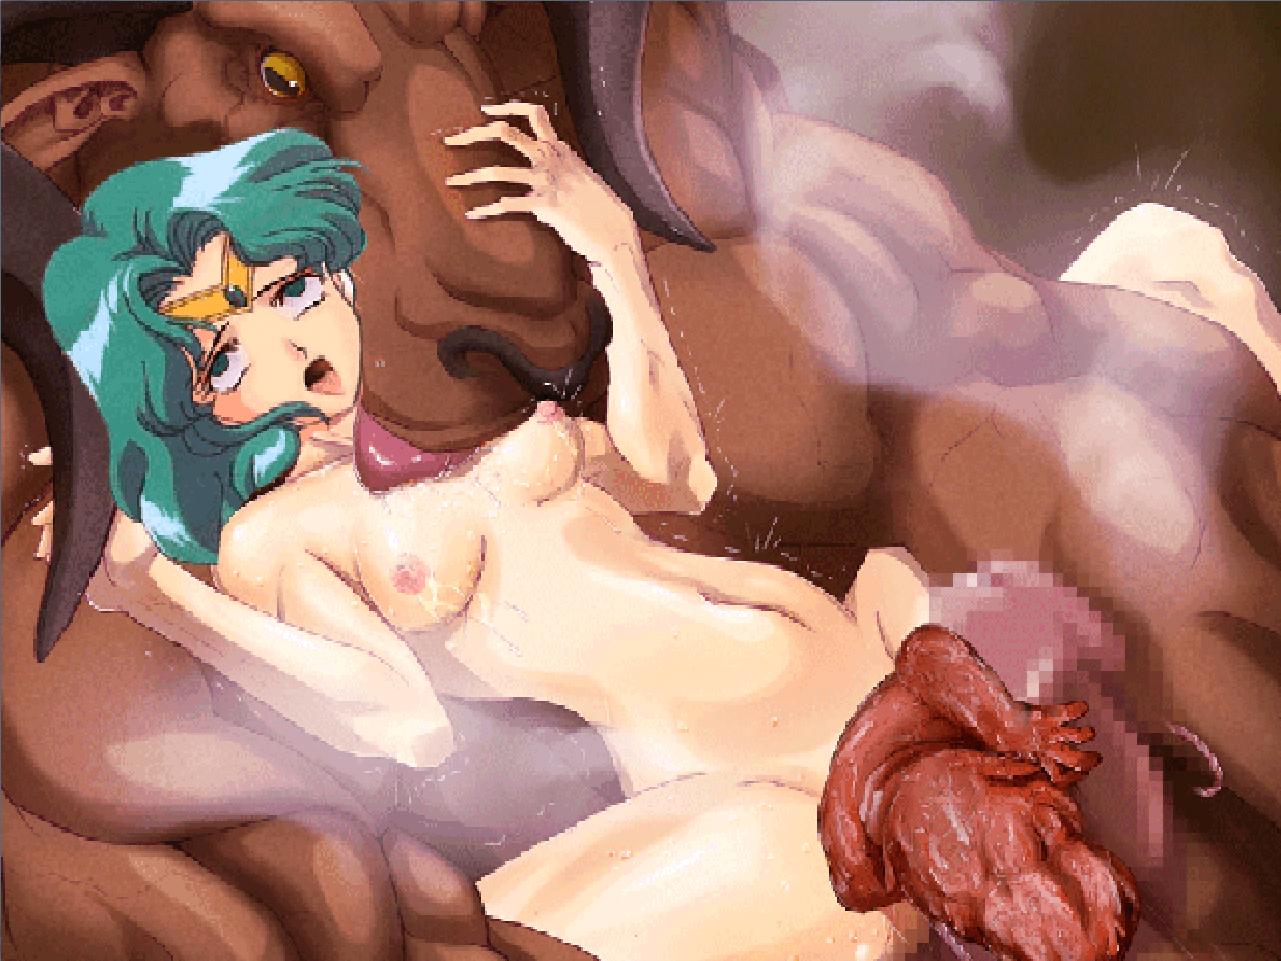 Female lesbian minotaur hentai pornos toons